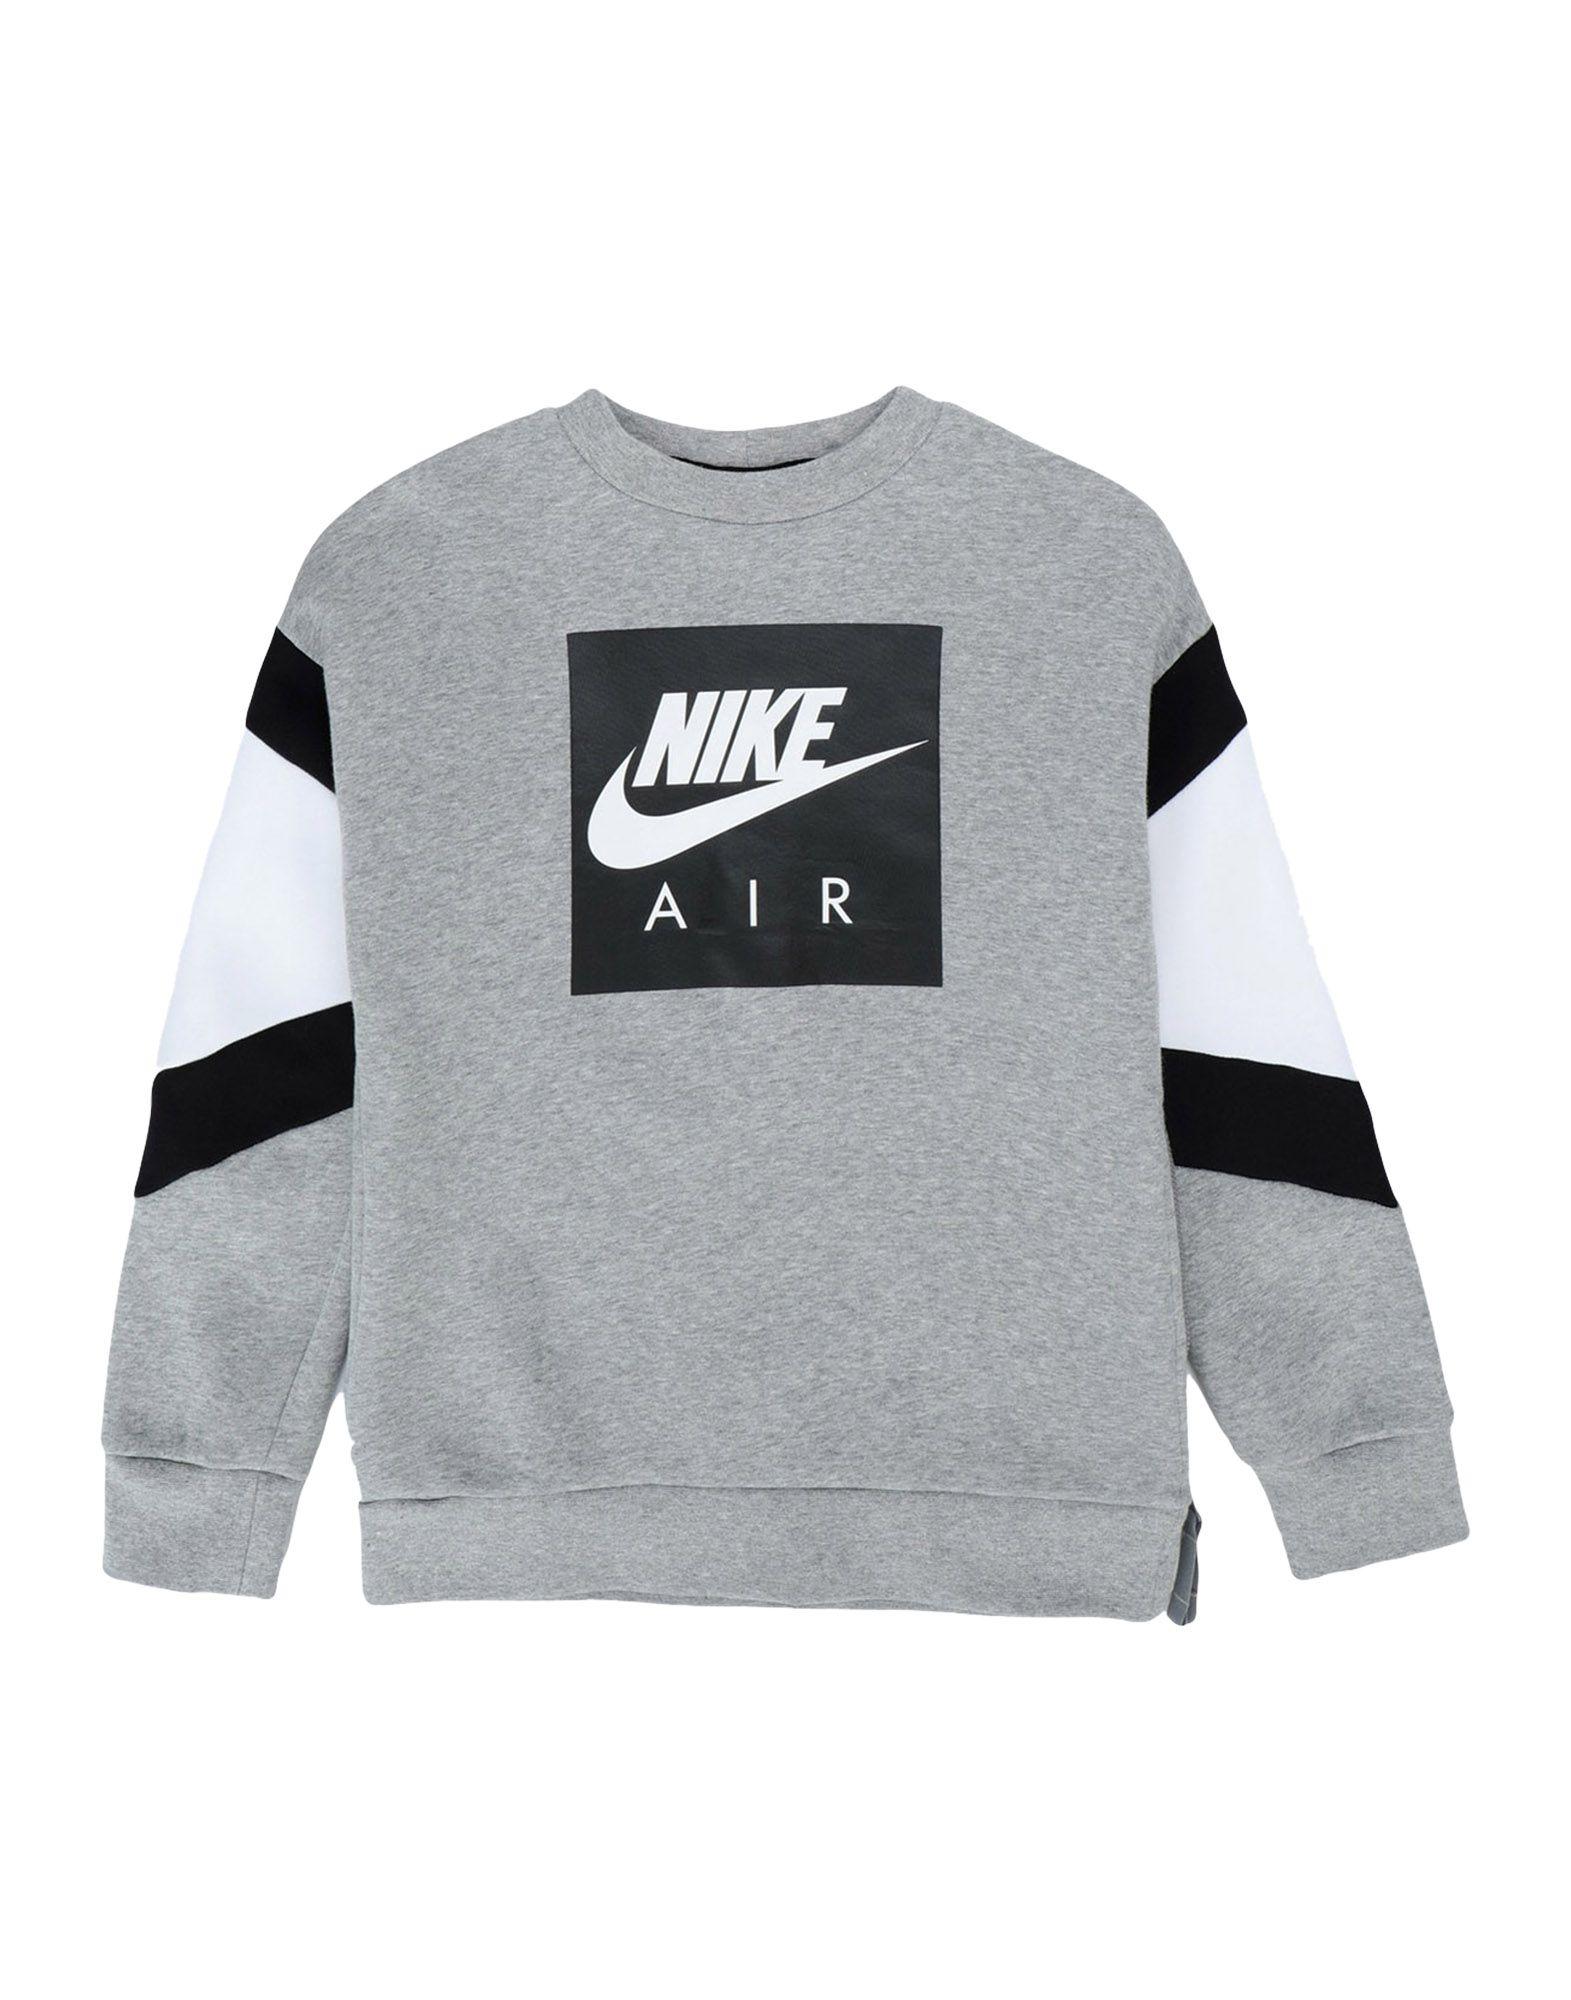 super service farblich passend Neuestes Design NIKE Sweatshirt - Jumpers and Sweatshirts   YOOX.COM